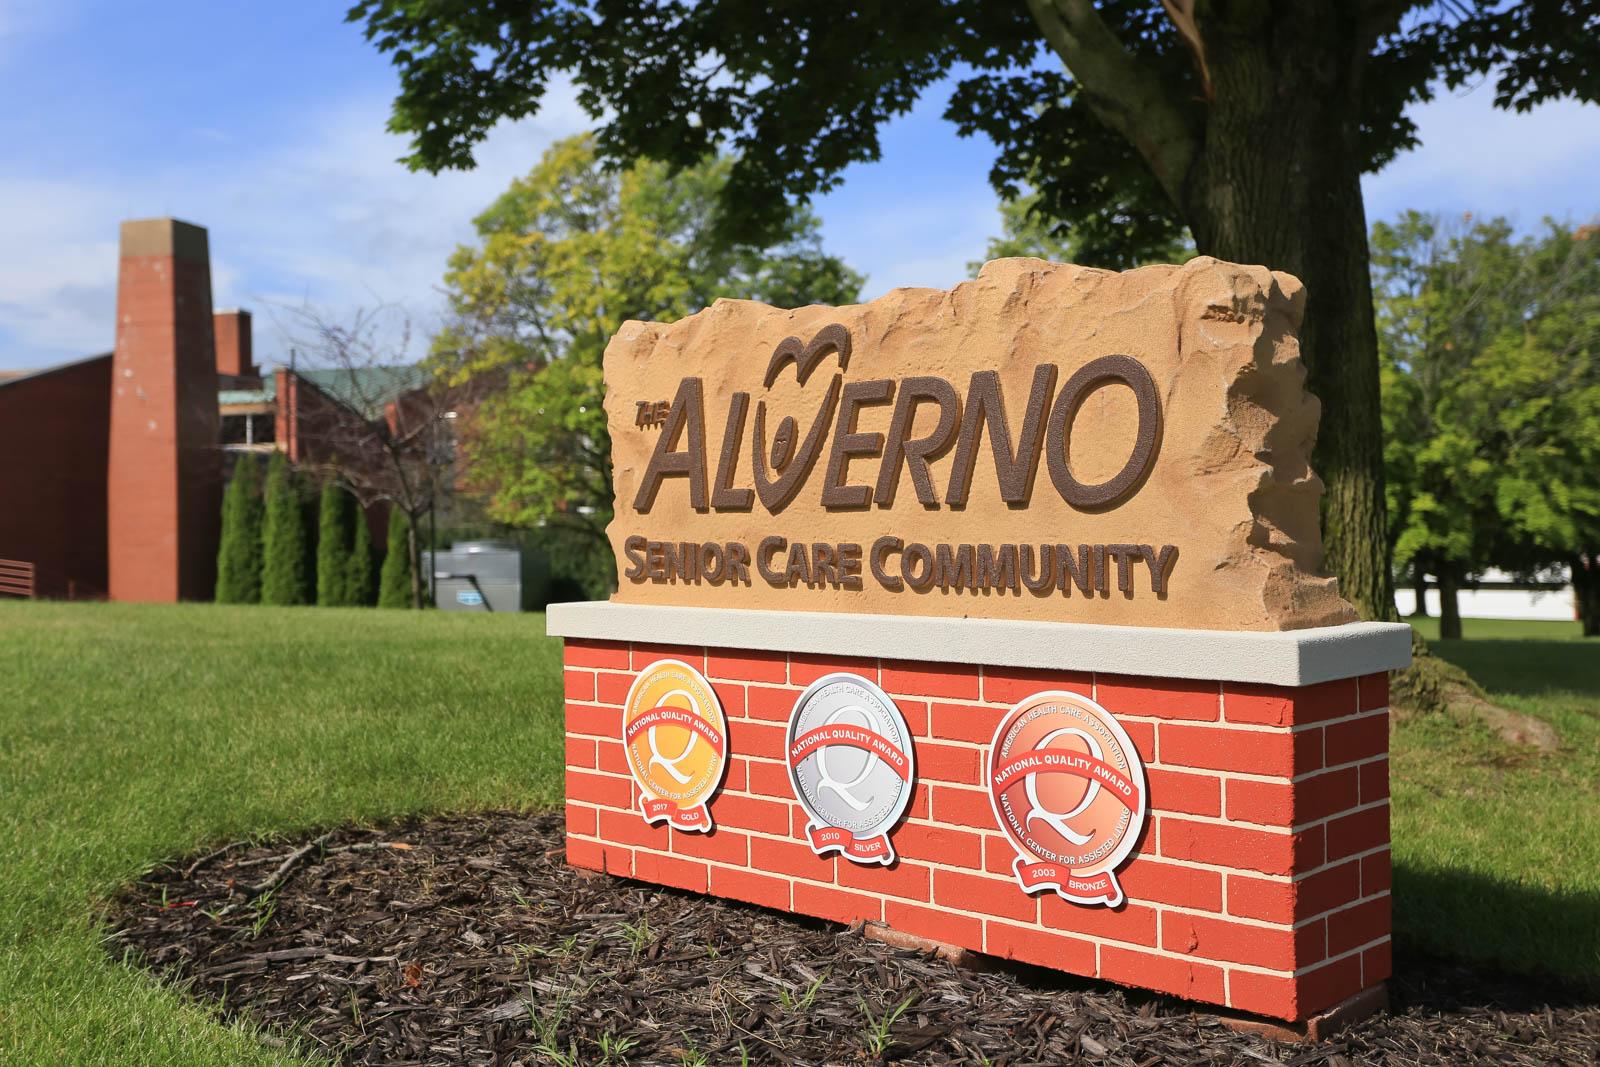 The Alverno Senior Care Community